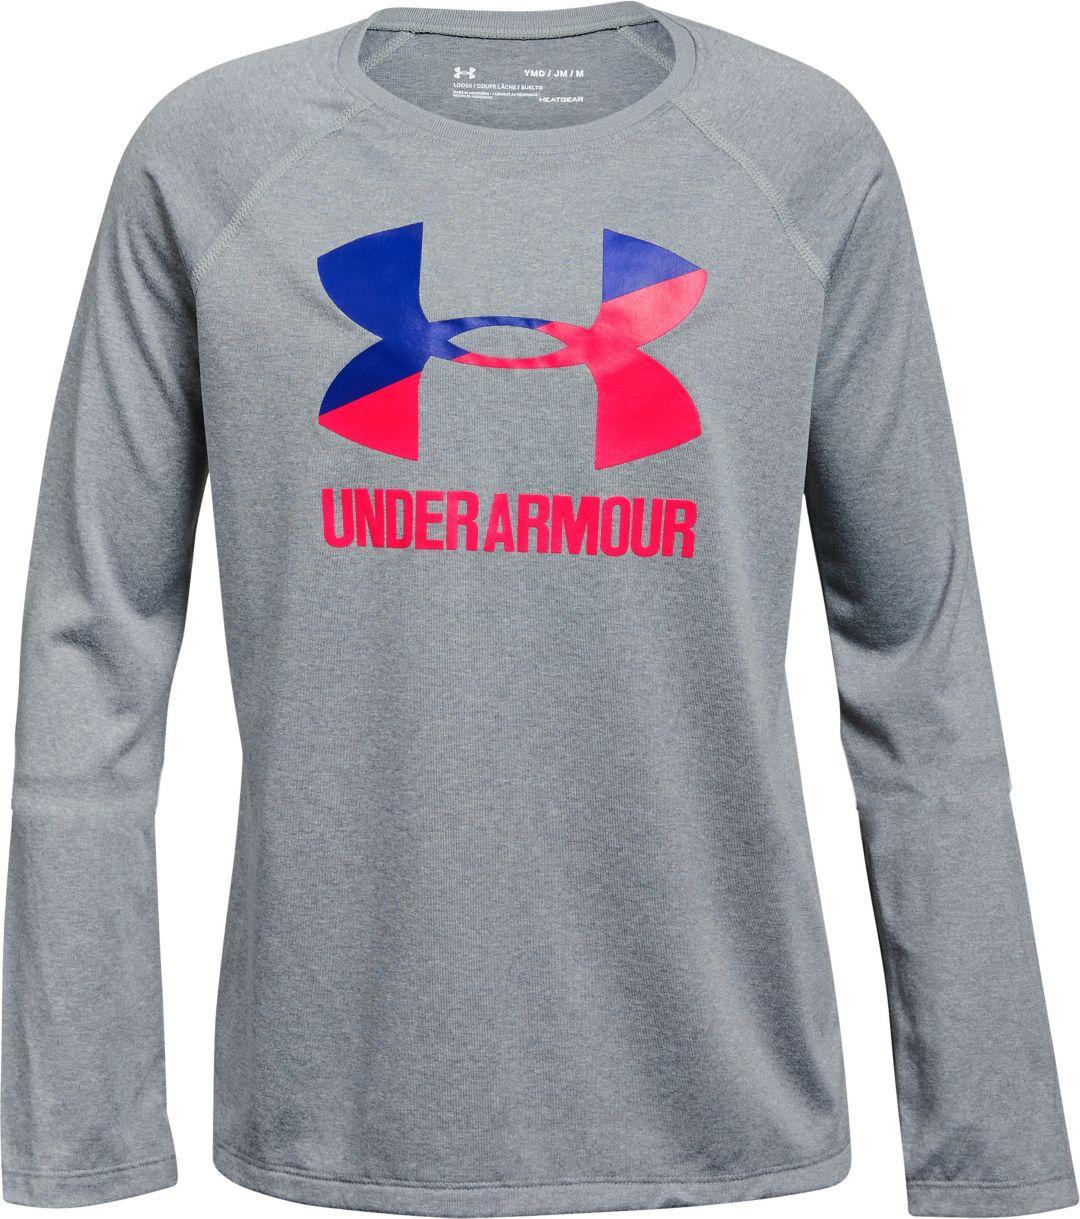 Under Armour Girl/'s Long Sleeve Shirt Grey M